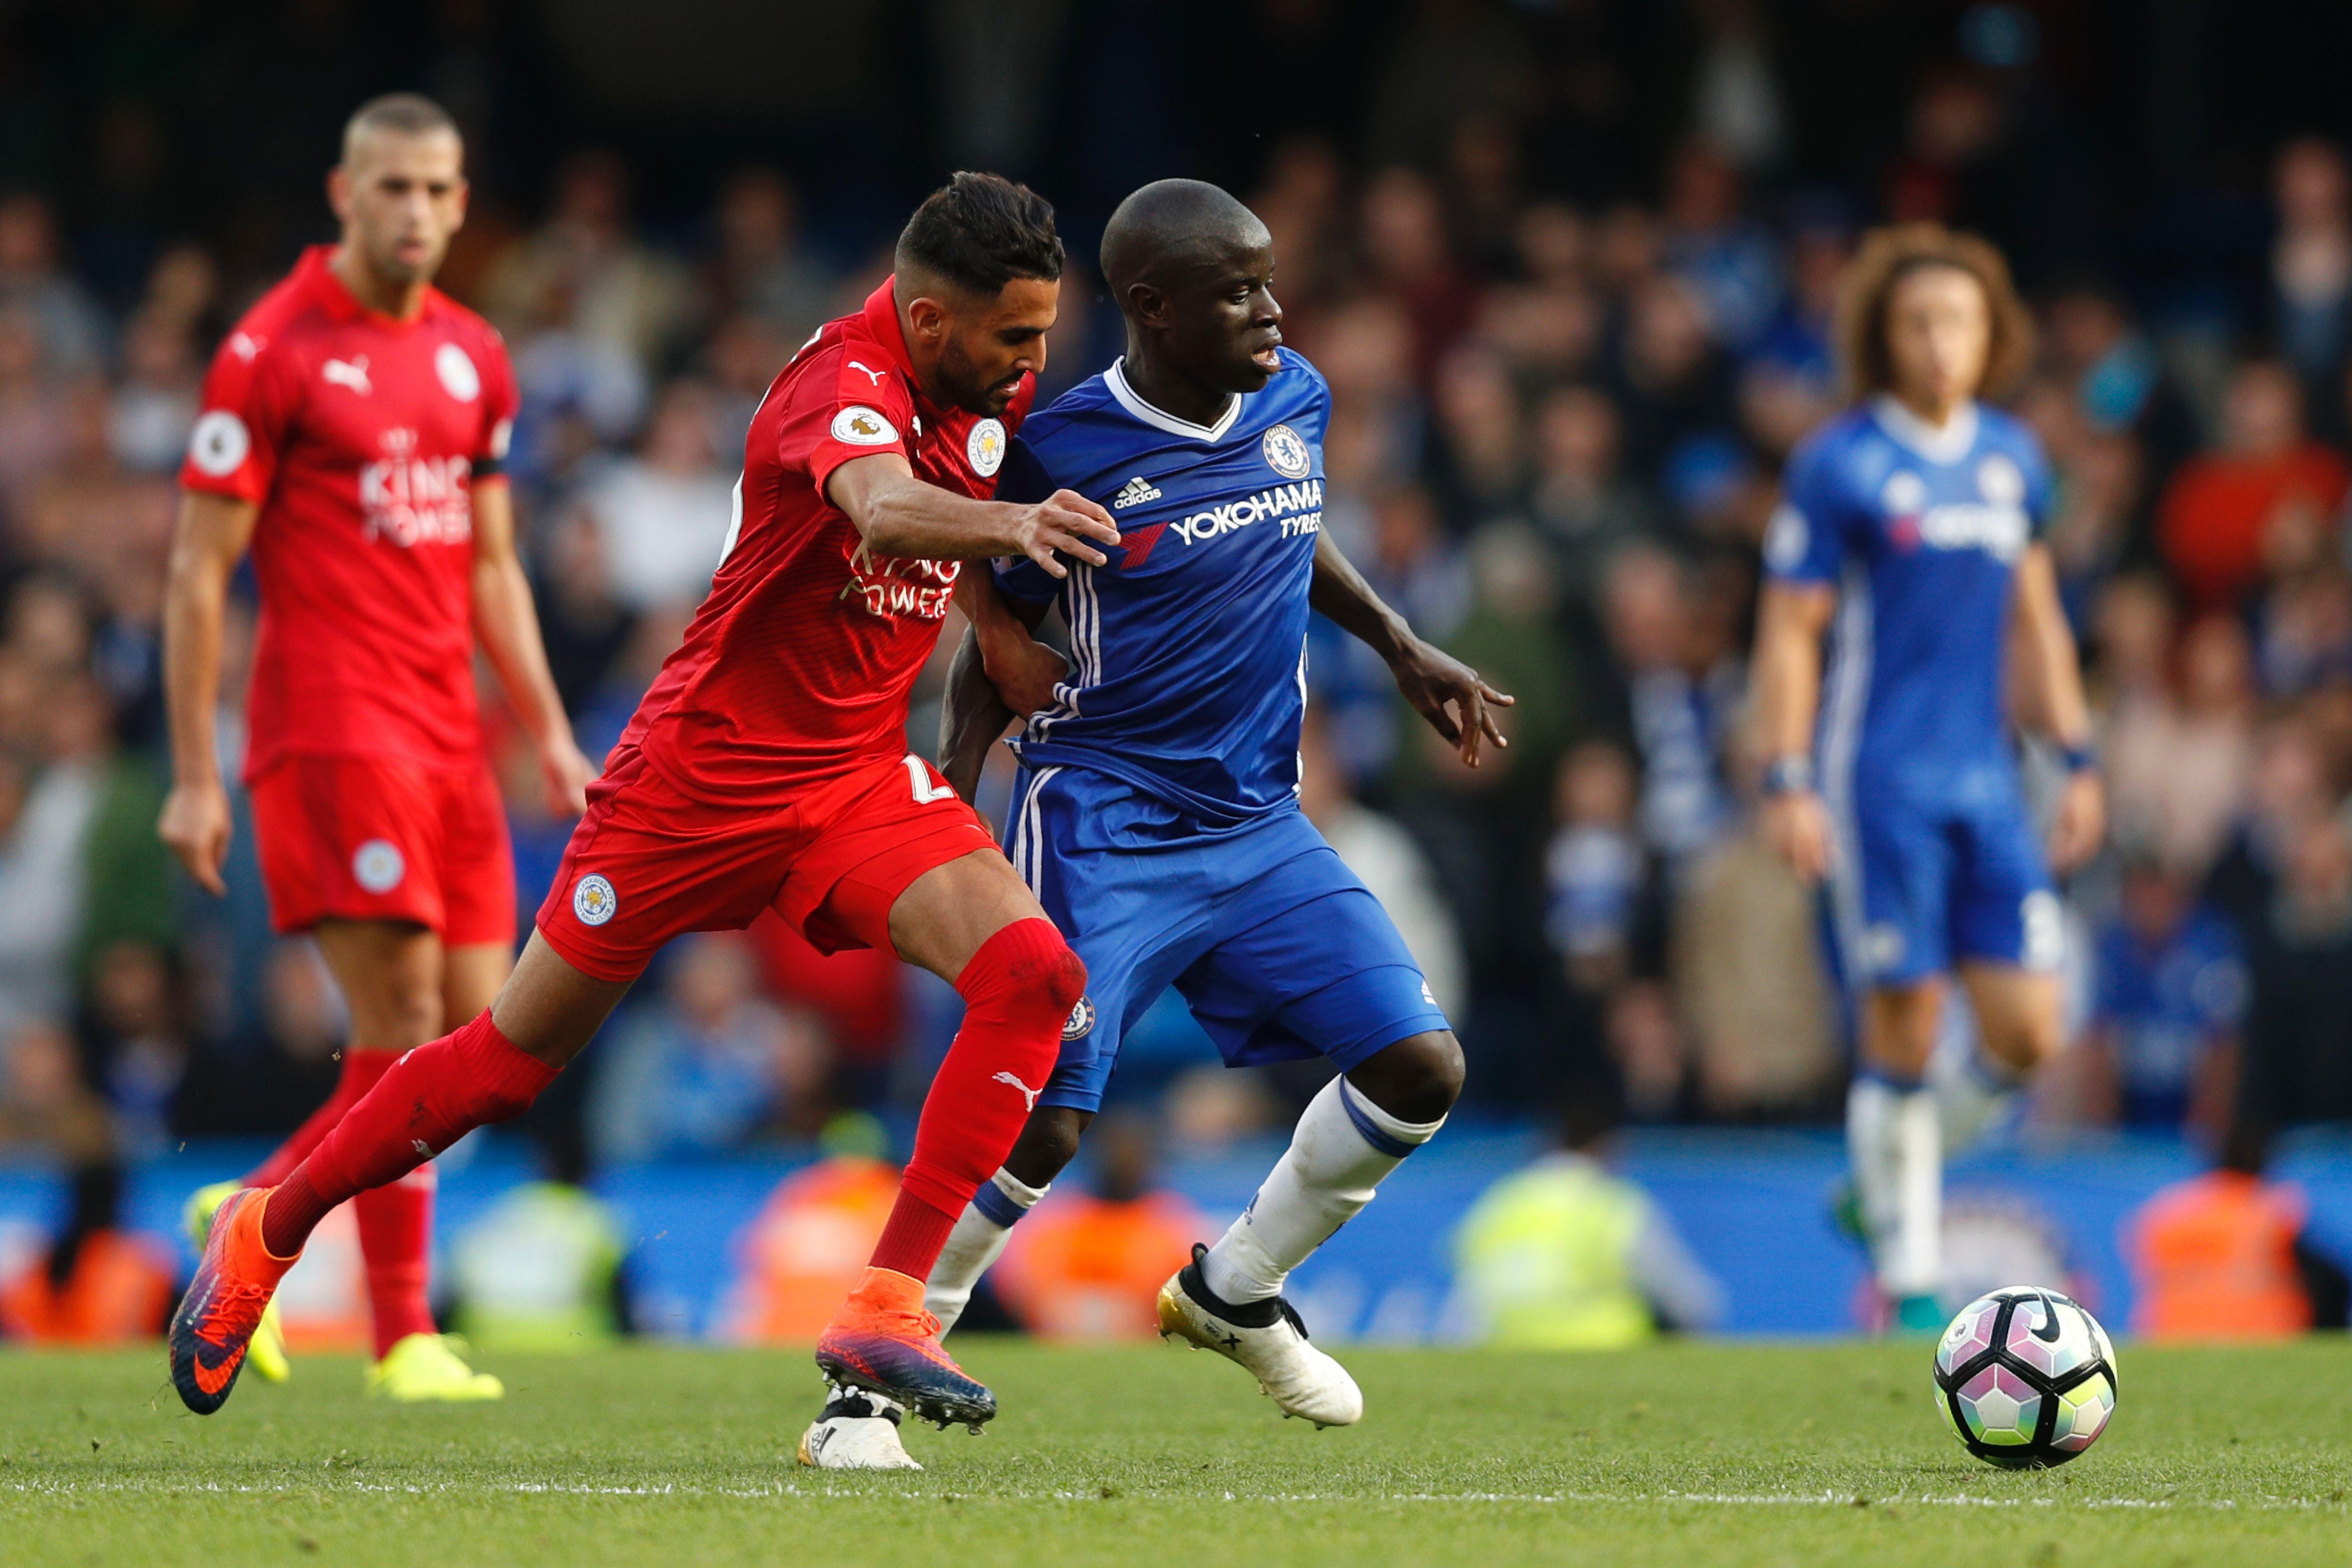 Riyard Mahrez, N'Golo Kante, Leicester City, Chelsea